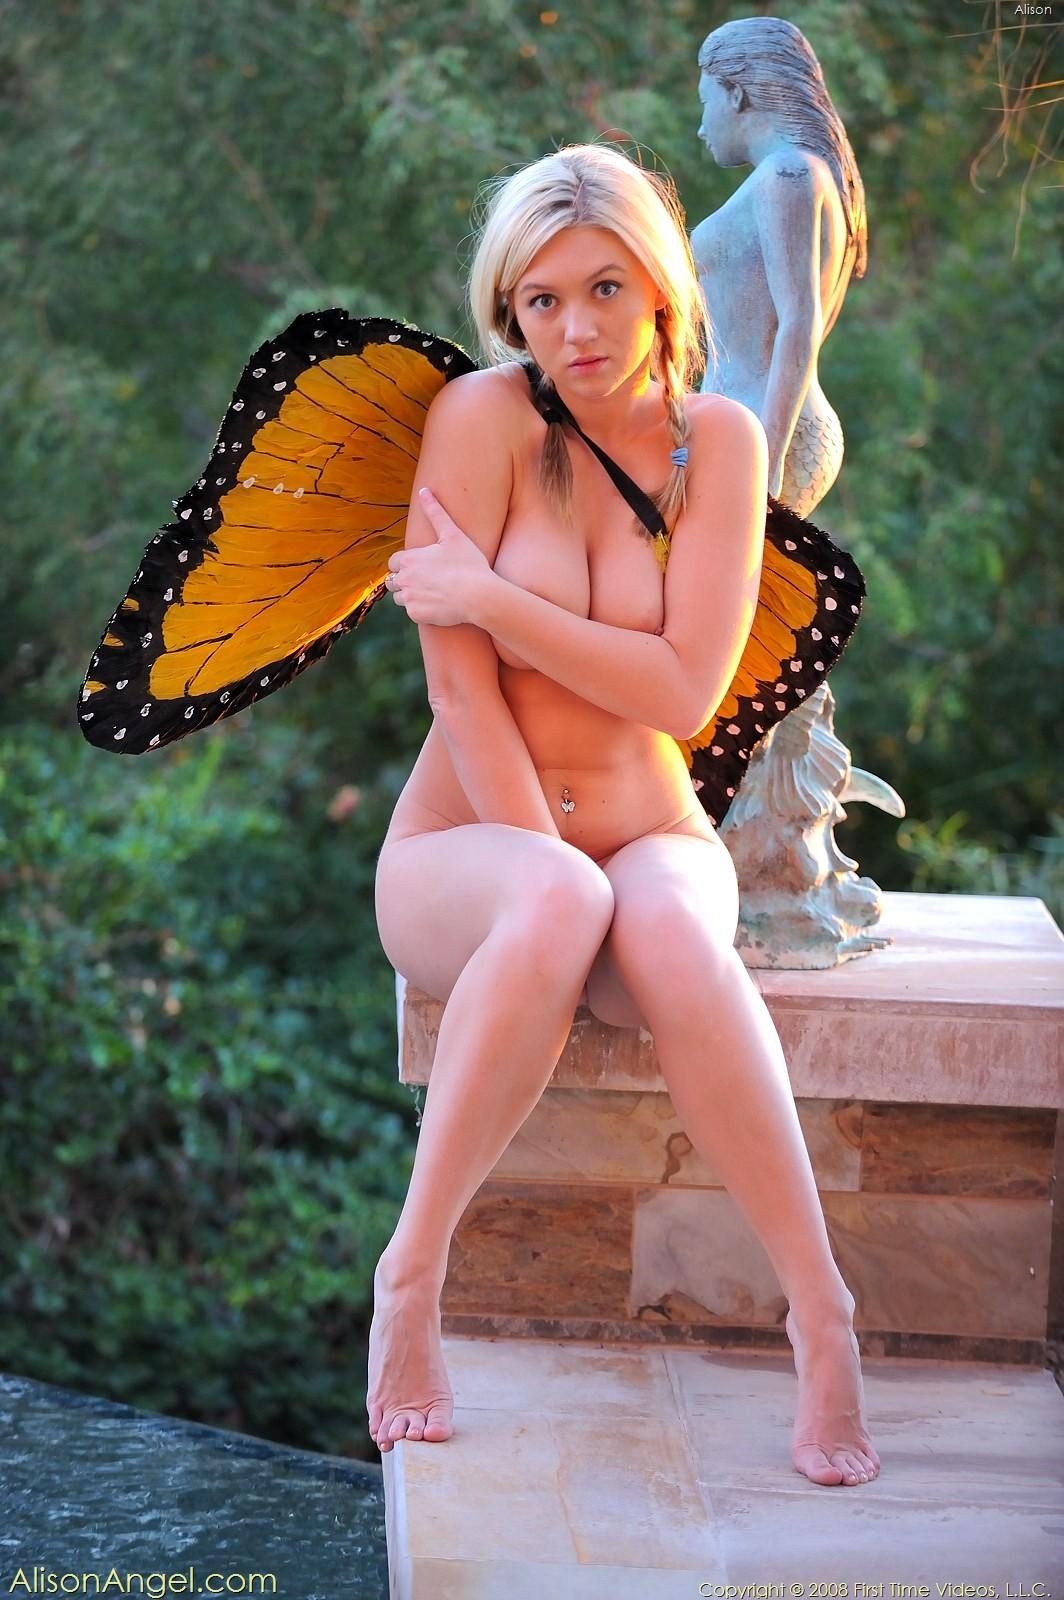 Alison angel today